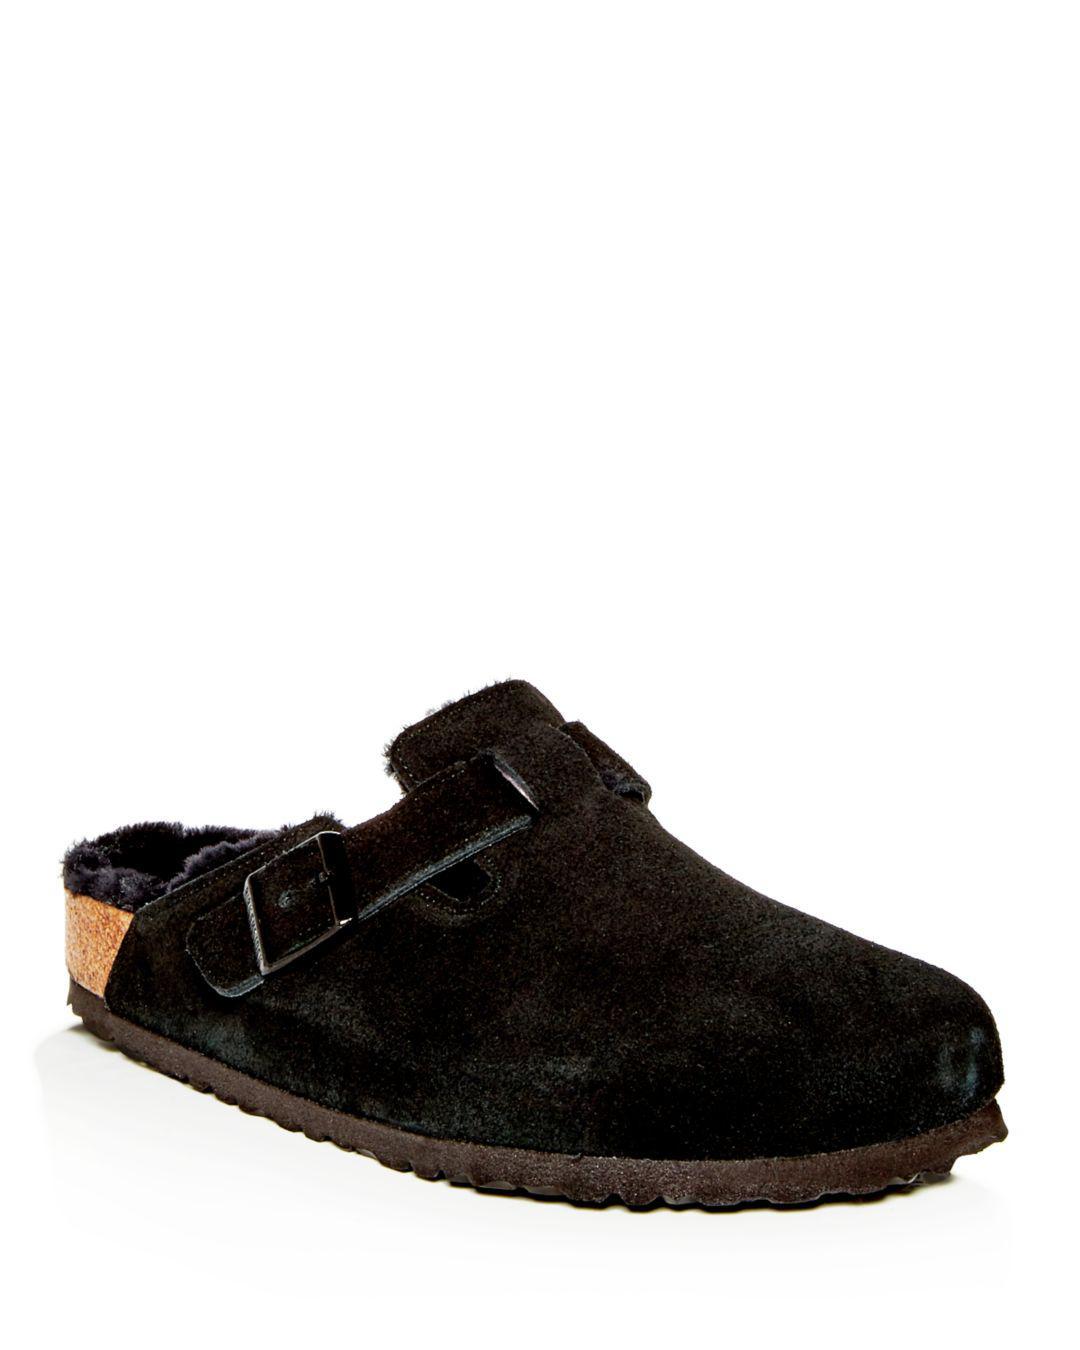 7faf3d90bcec Birkenstock Men's Boston Leather & Shearling Mules in Black for Men ...